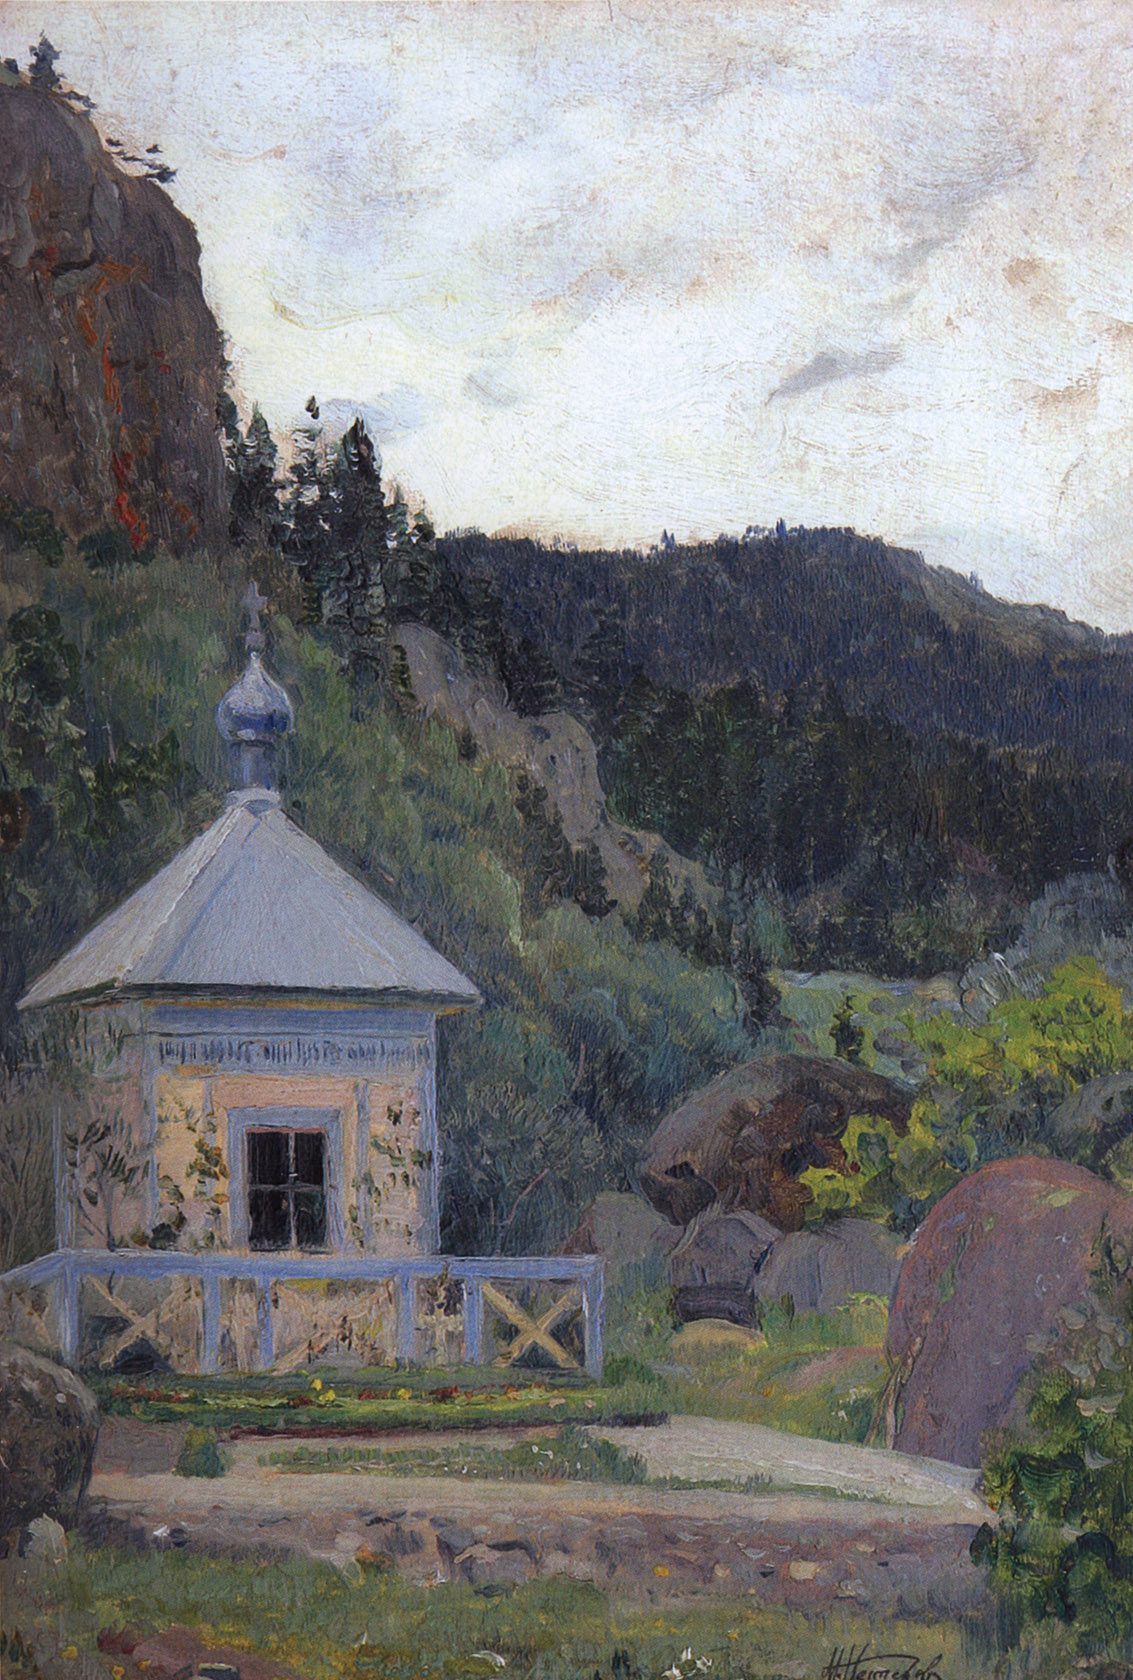 Mikhail Vasilyevich Nesterov. Abastuman. Etude